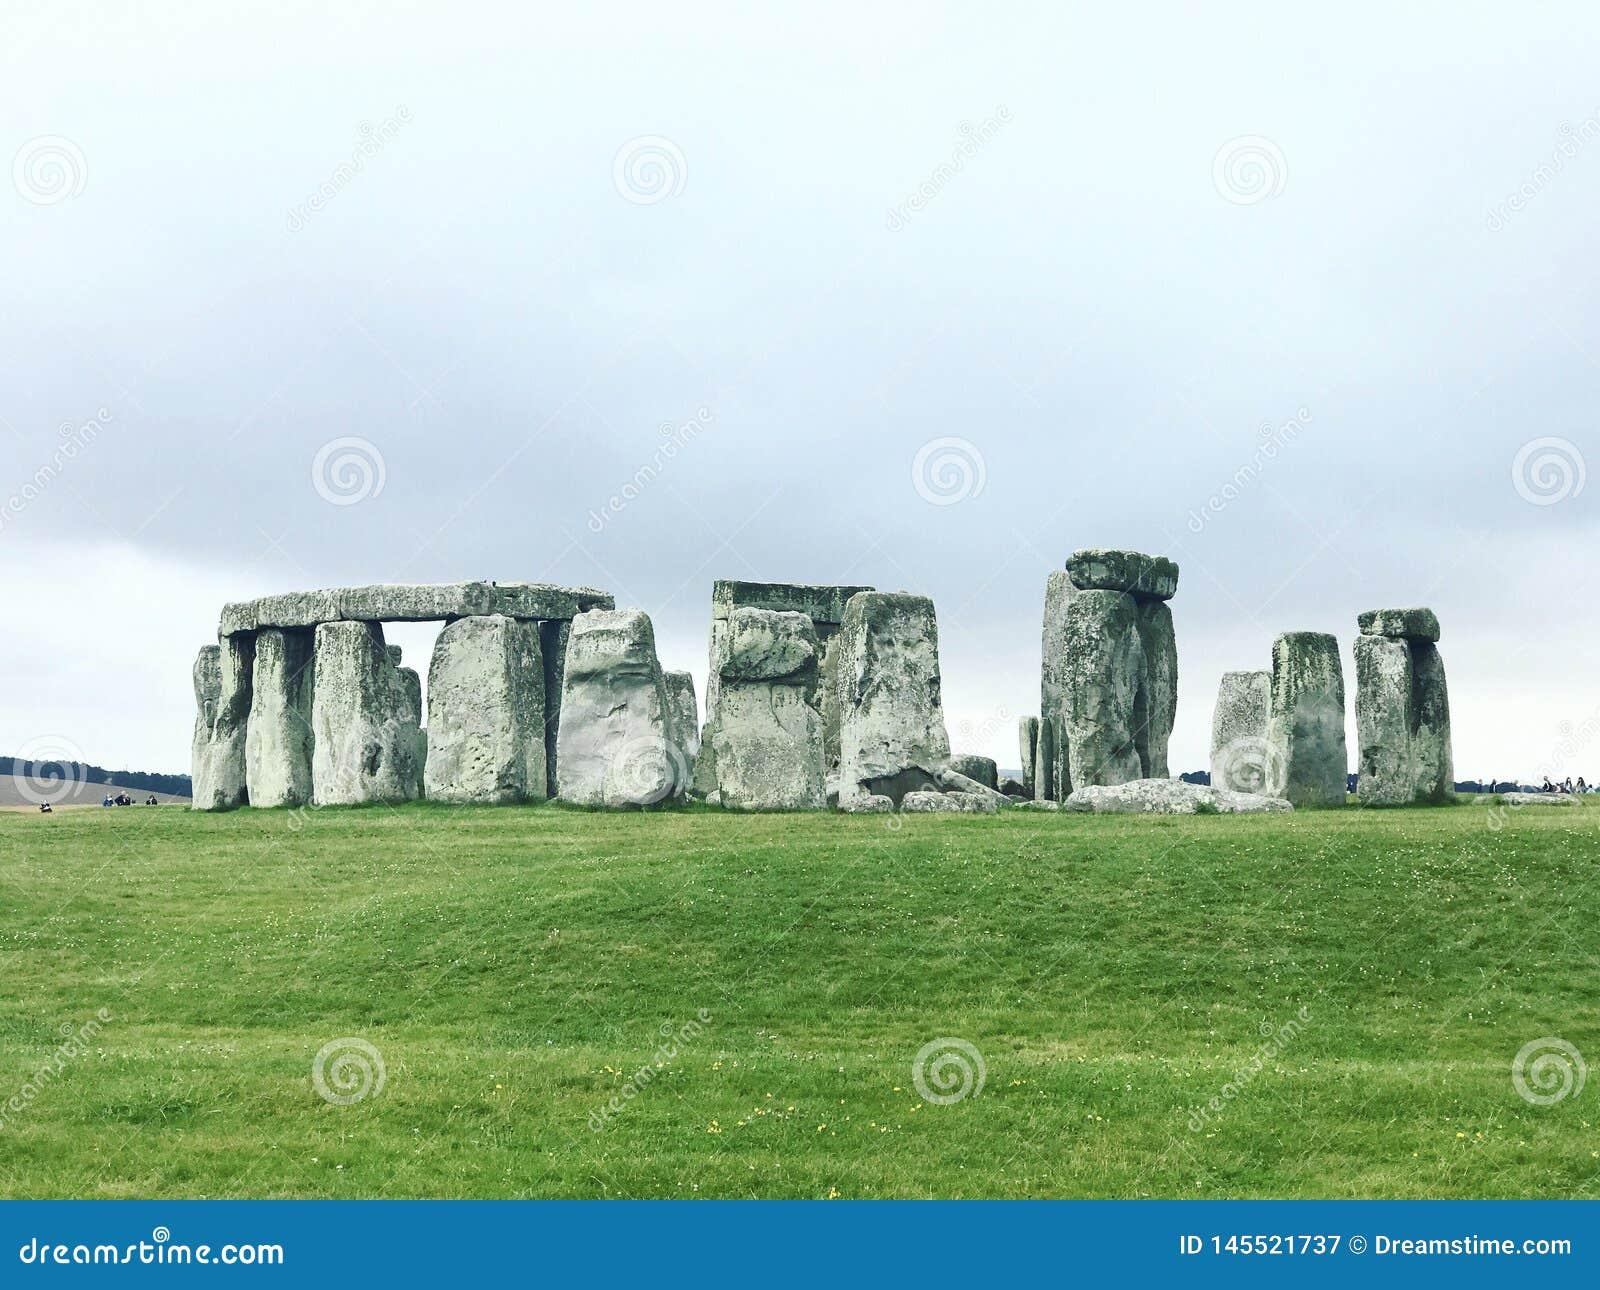 The Mysteries of Stone Henge